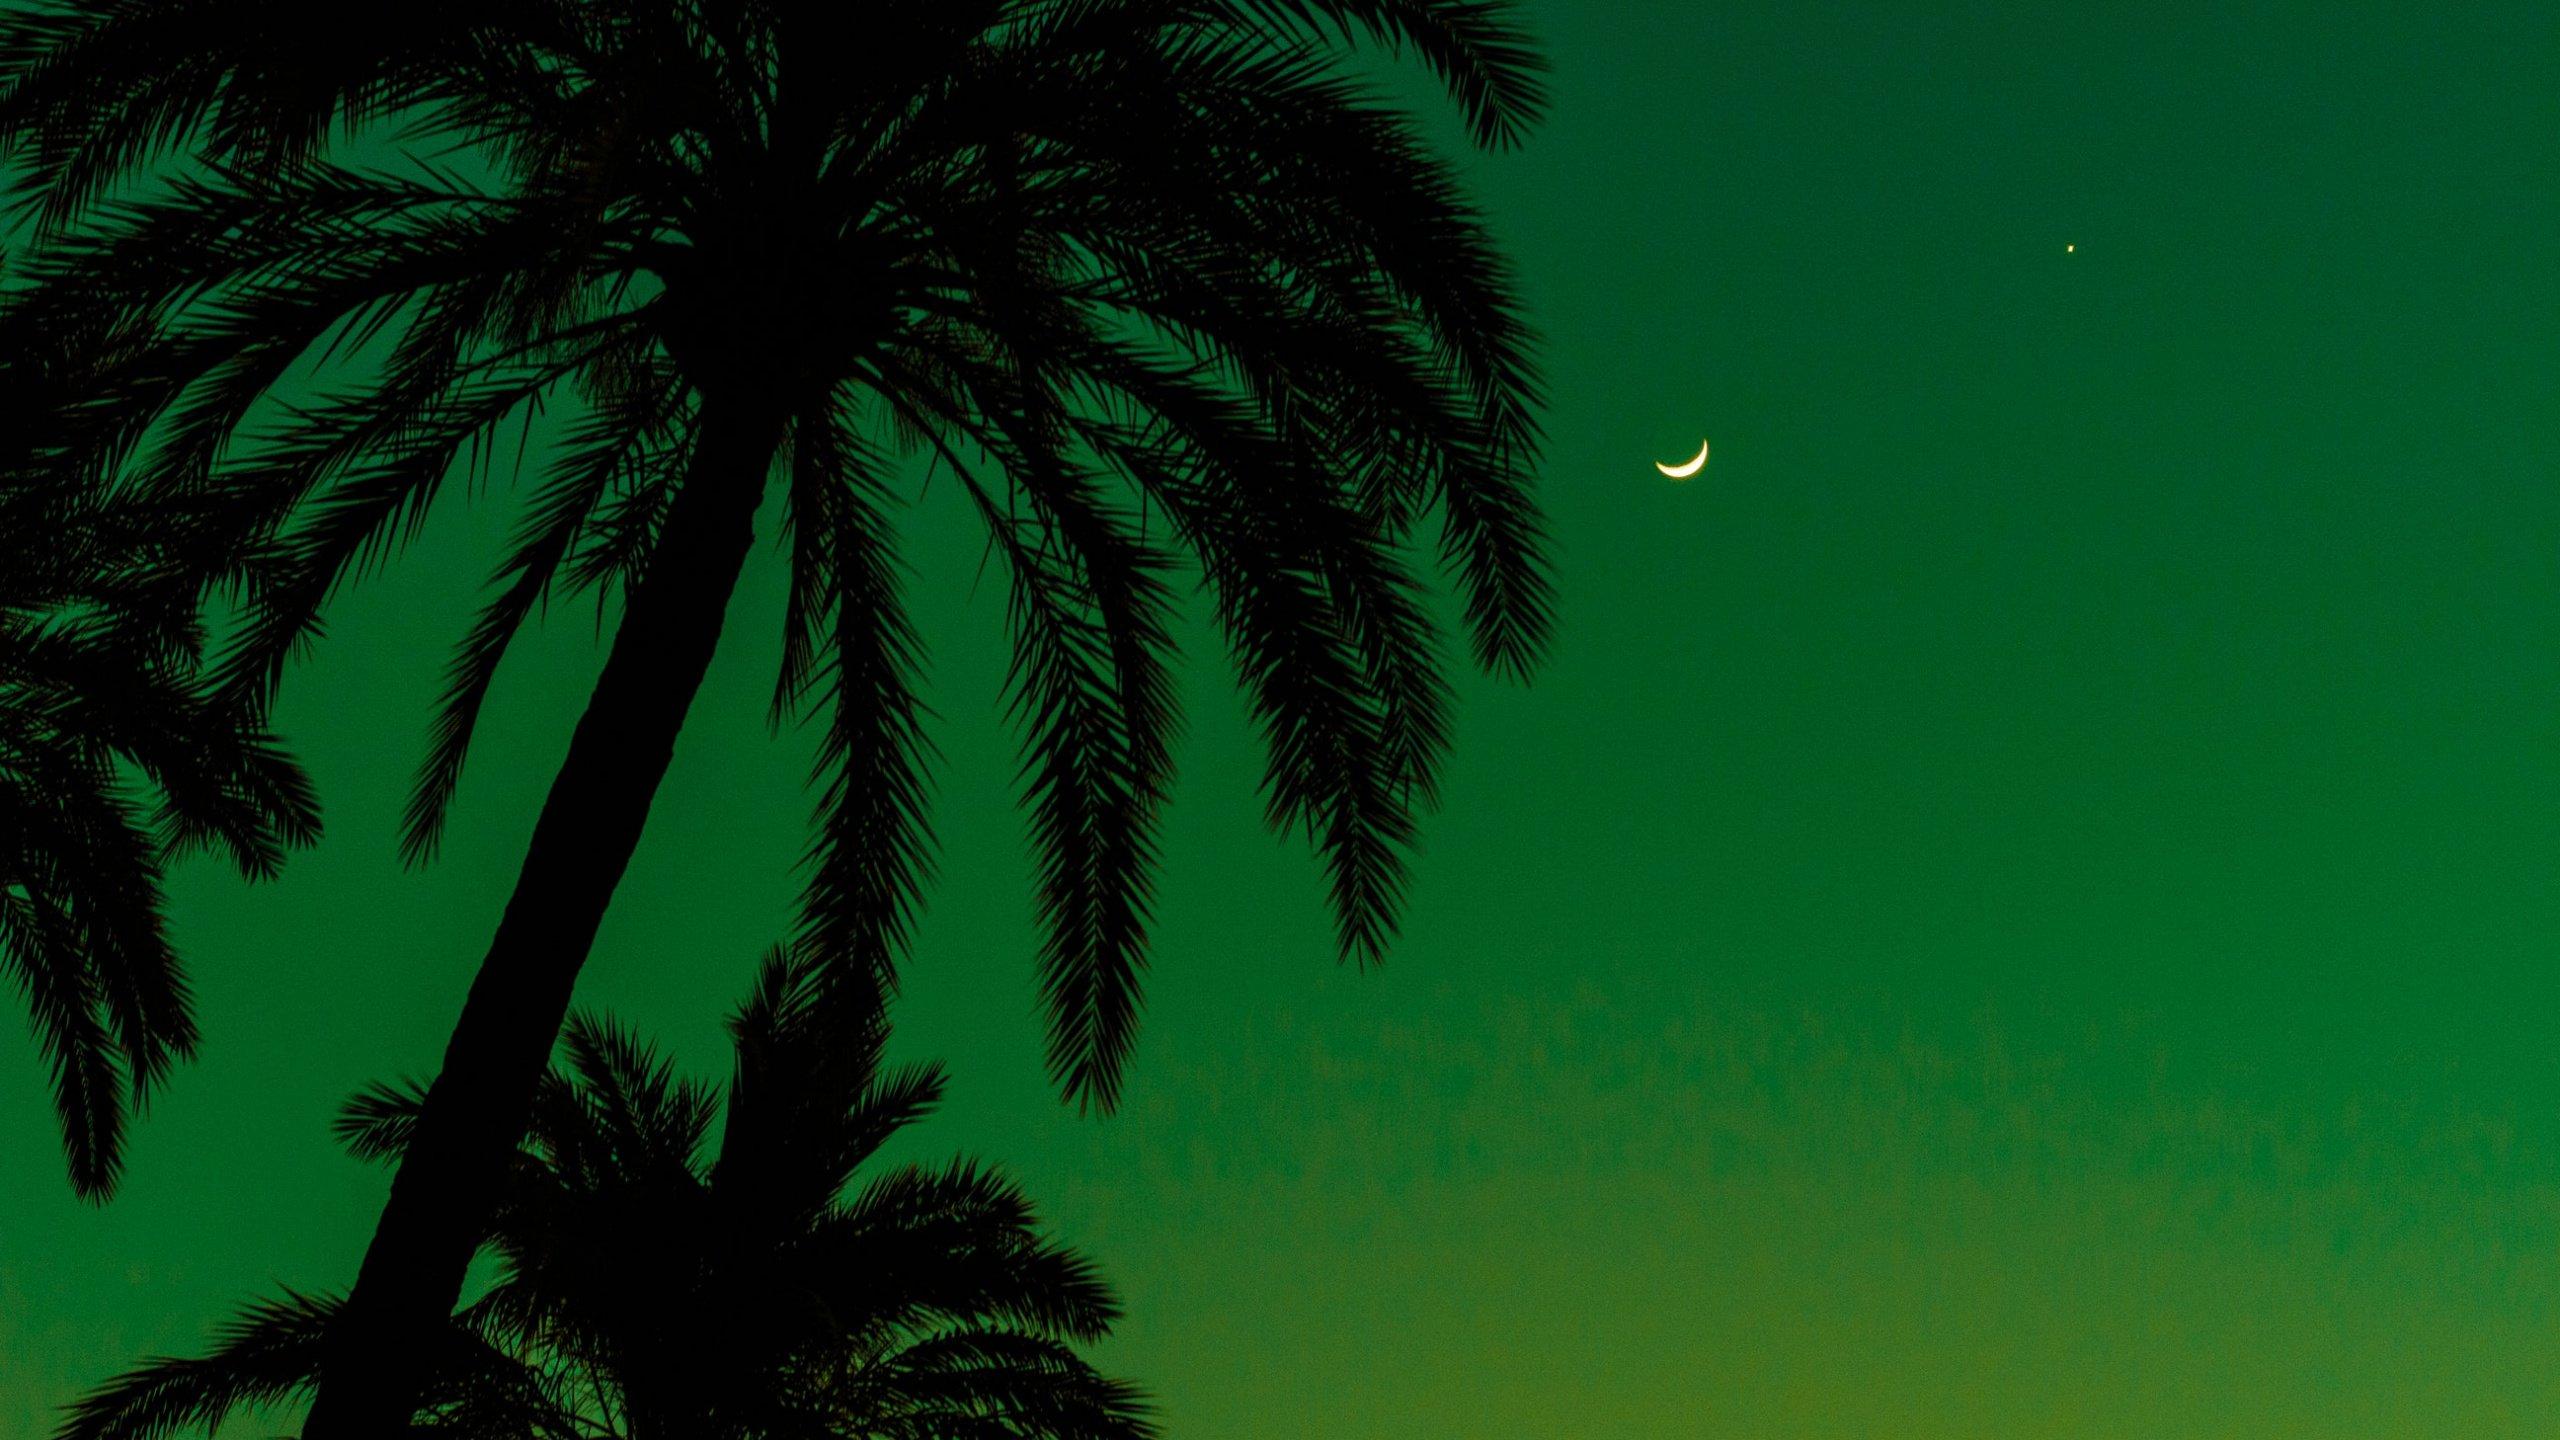 Palm Tree Screensaver HD Download